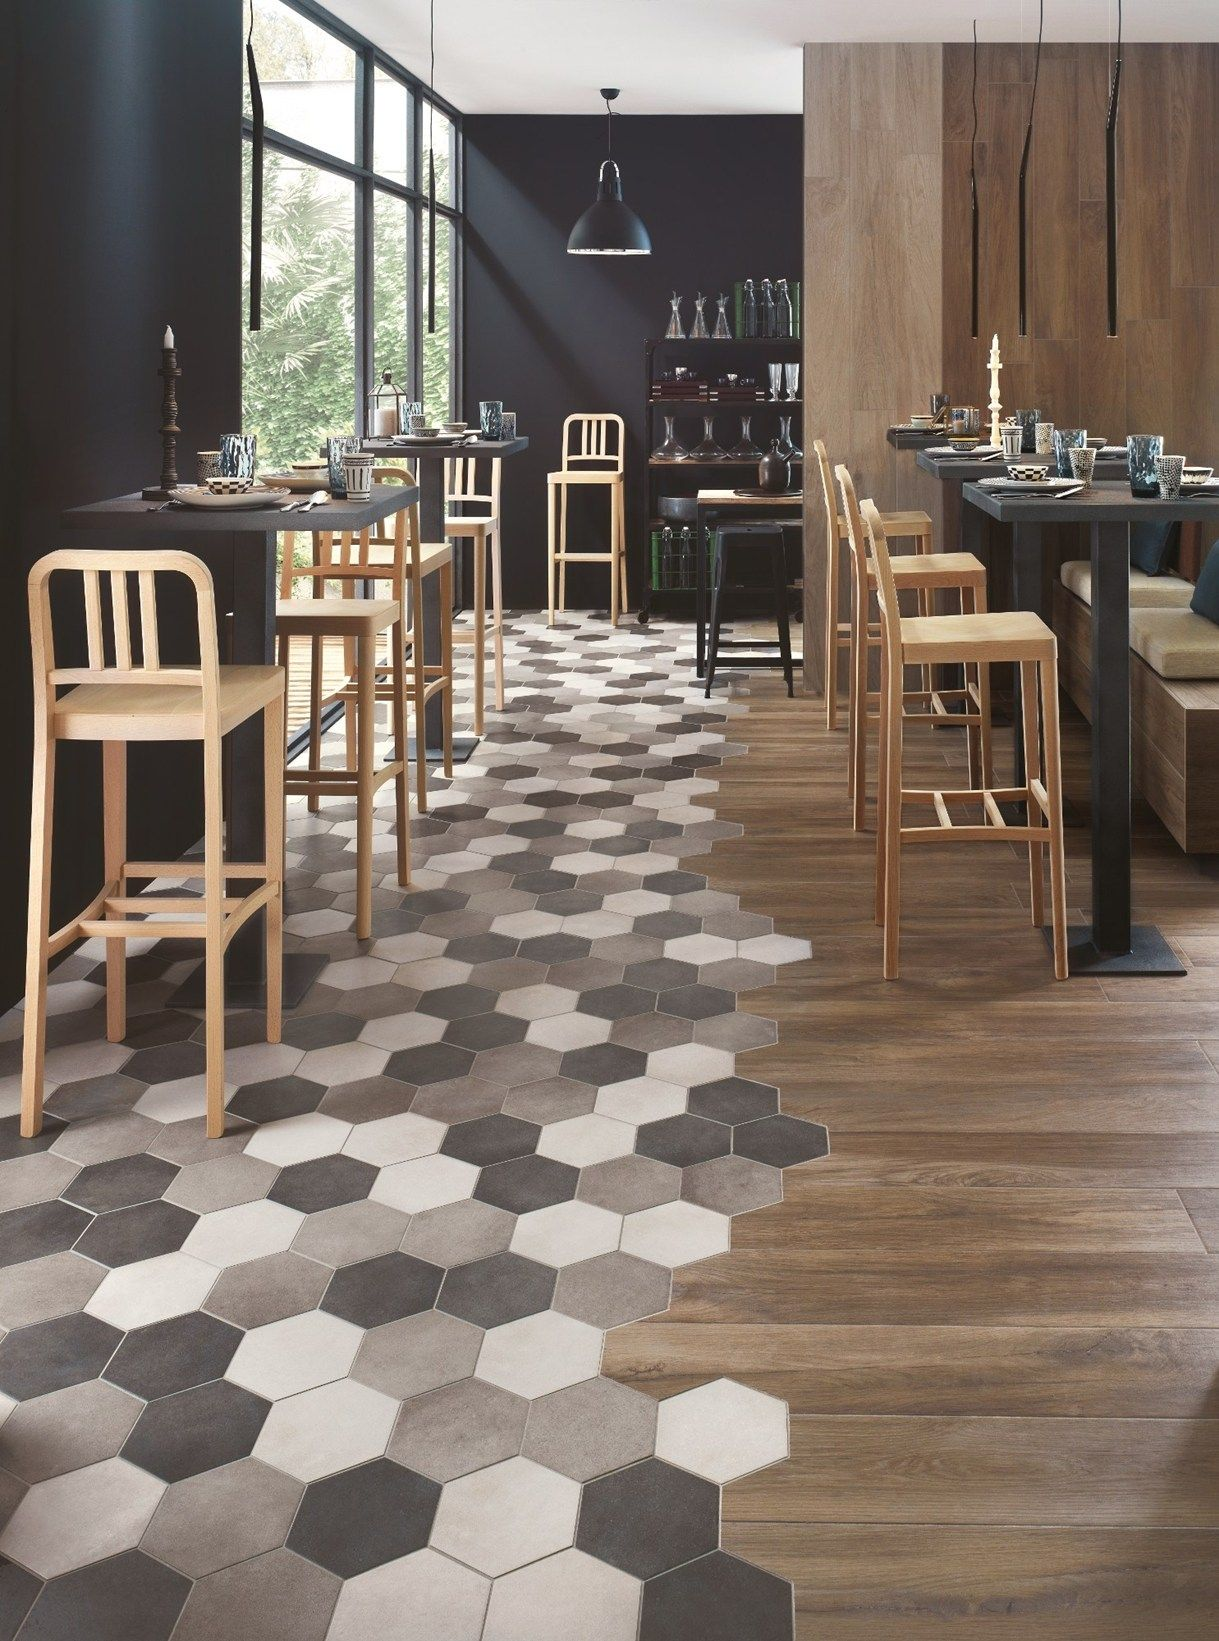 Cinque tonalità naturali riproducono la texture del legno ...